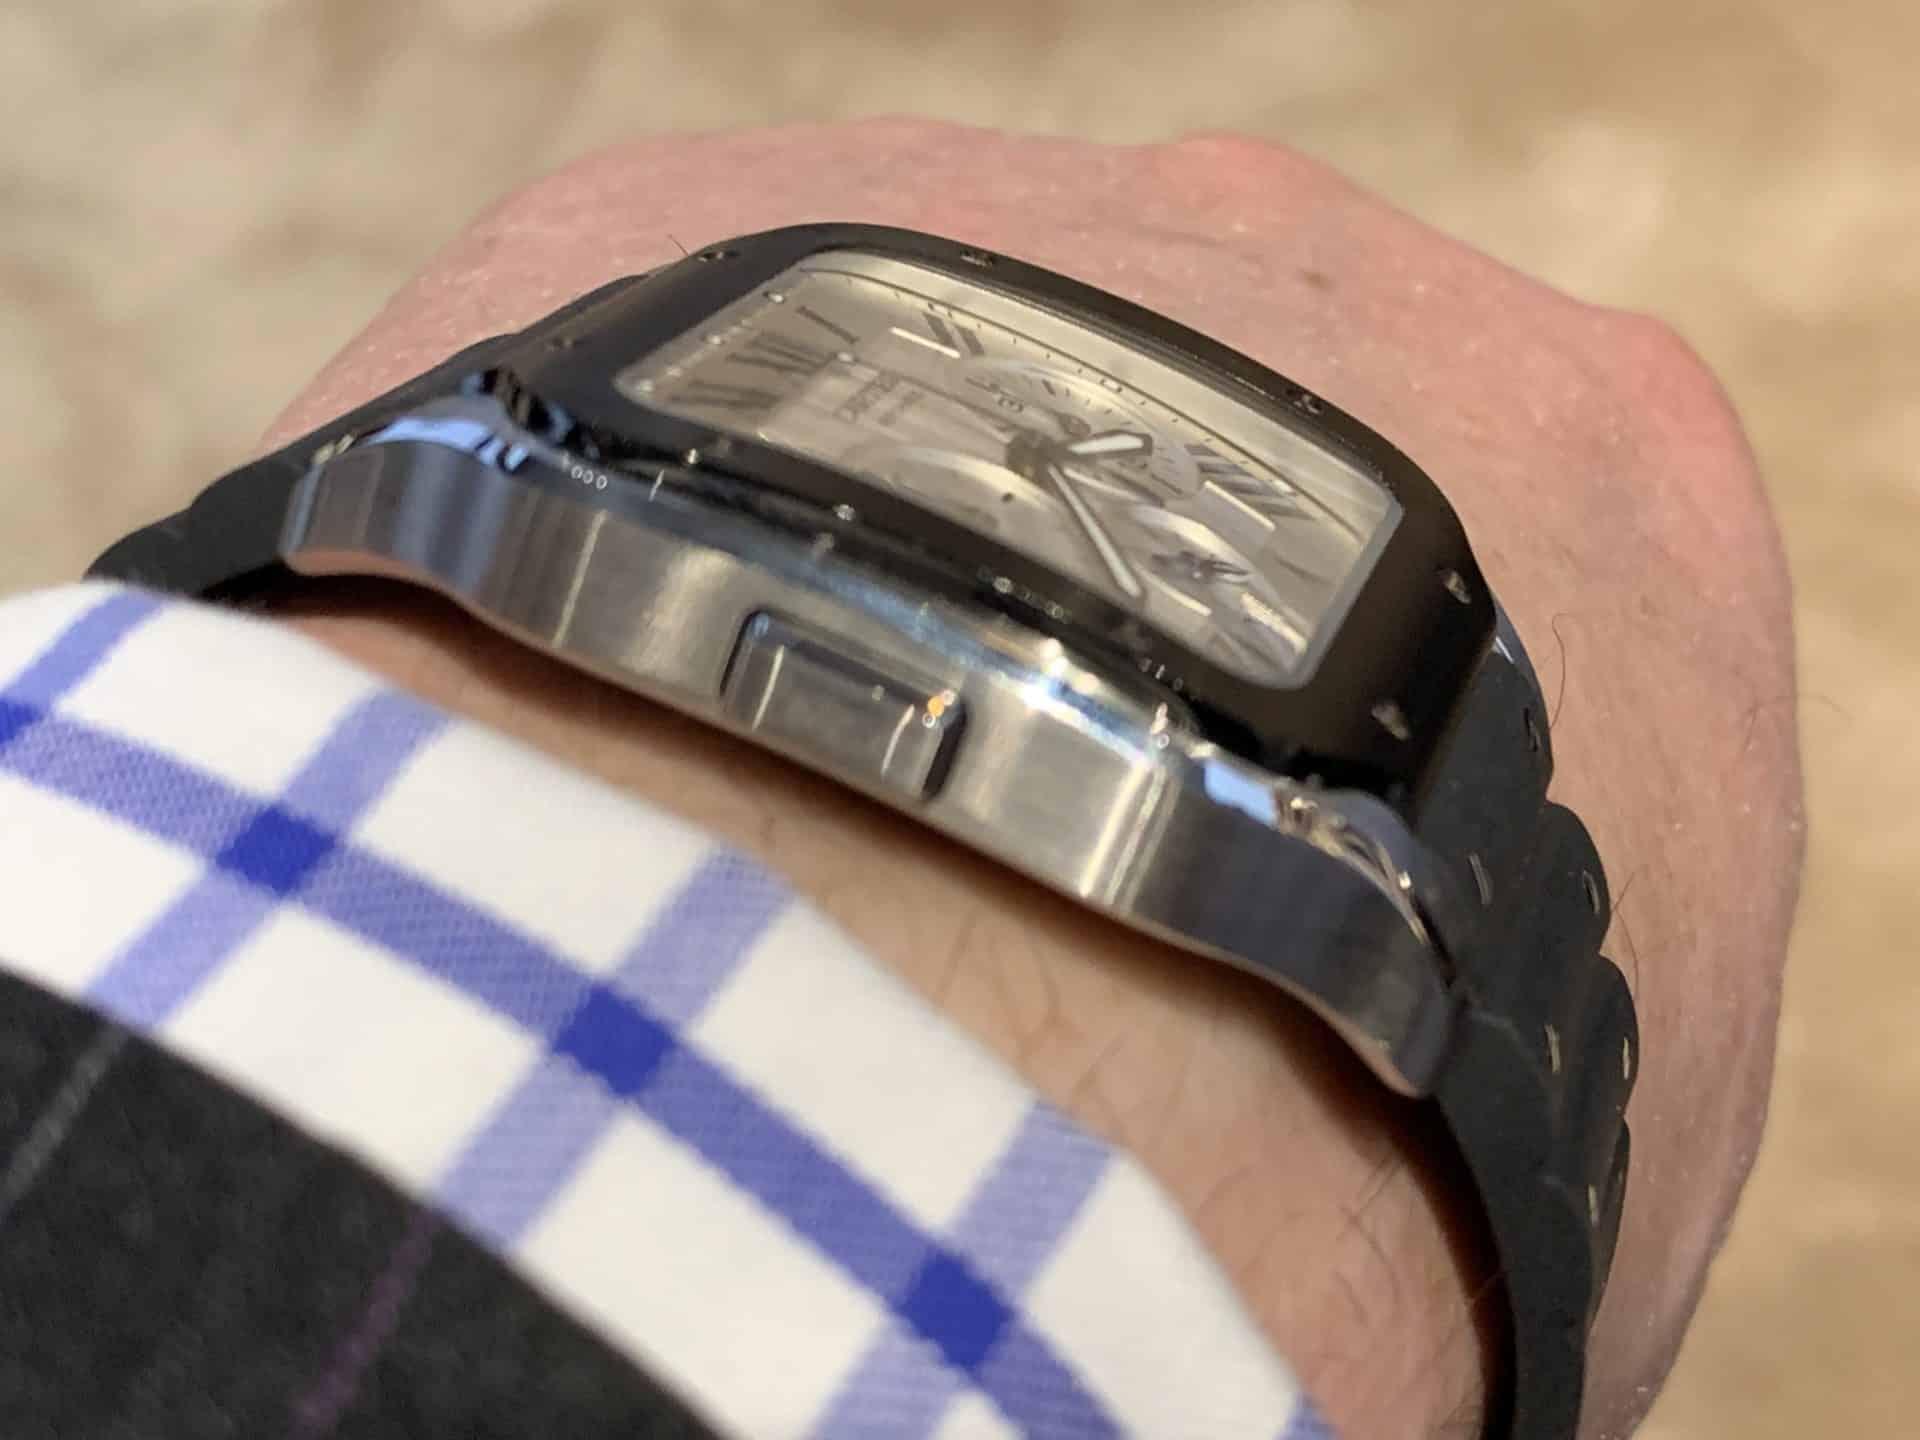 Cartier Santos Chronograph Automatic mit dem Start-Stopp-Drücker bei der 9